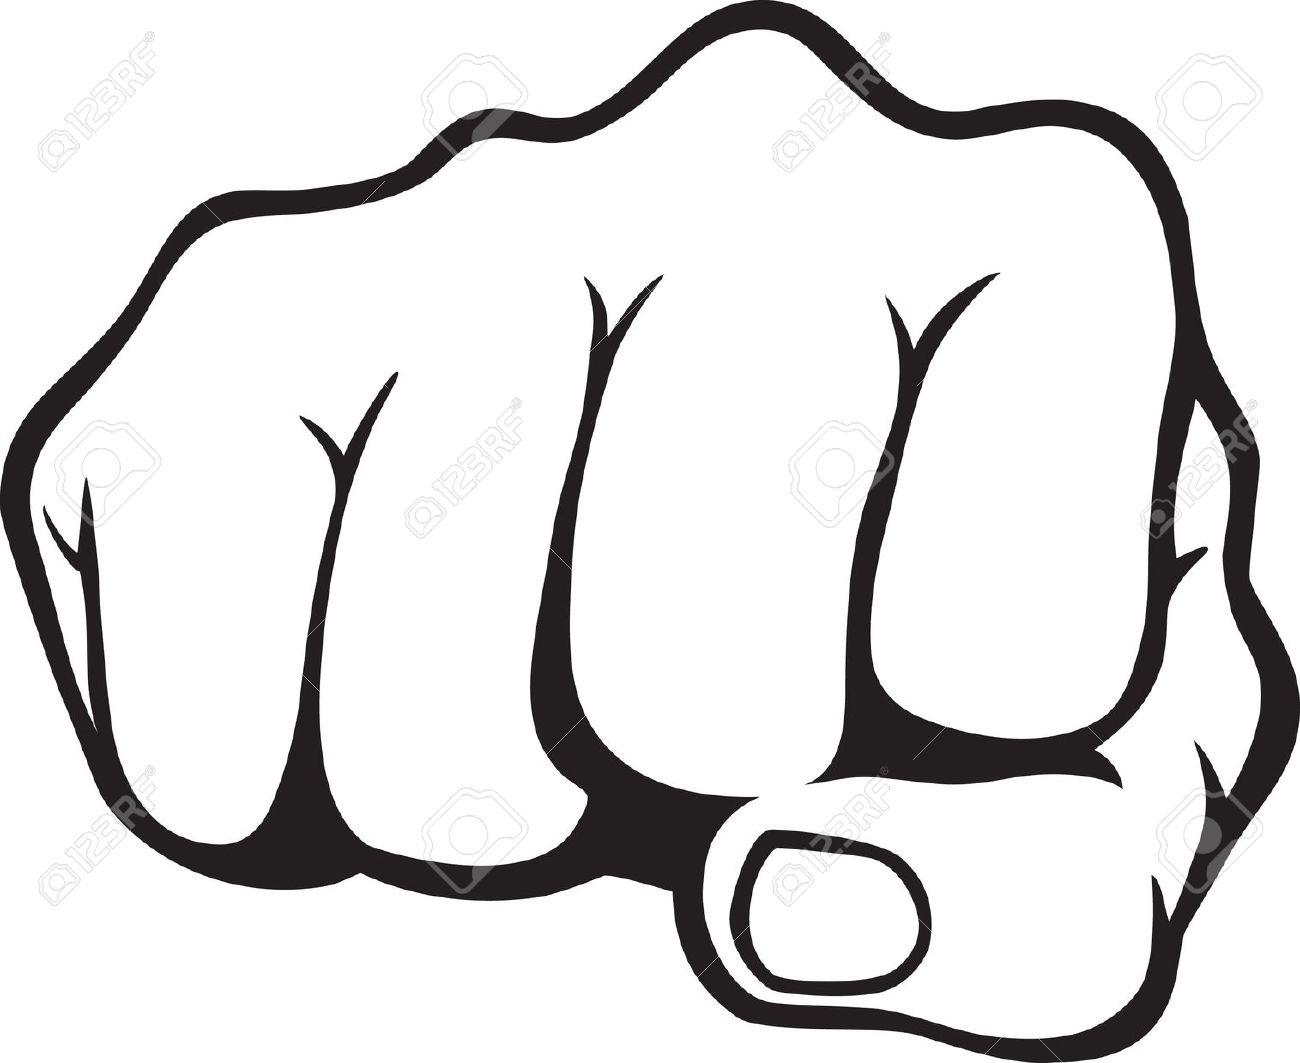 1300x1063 Drawn Fist Hand Punch